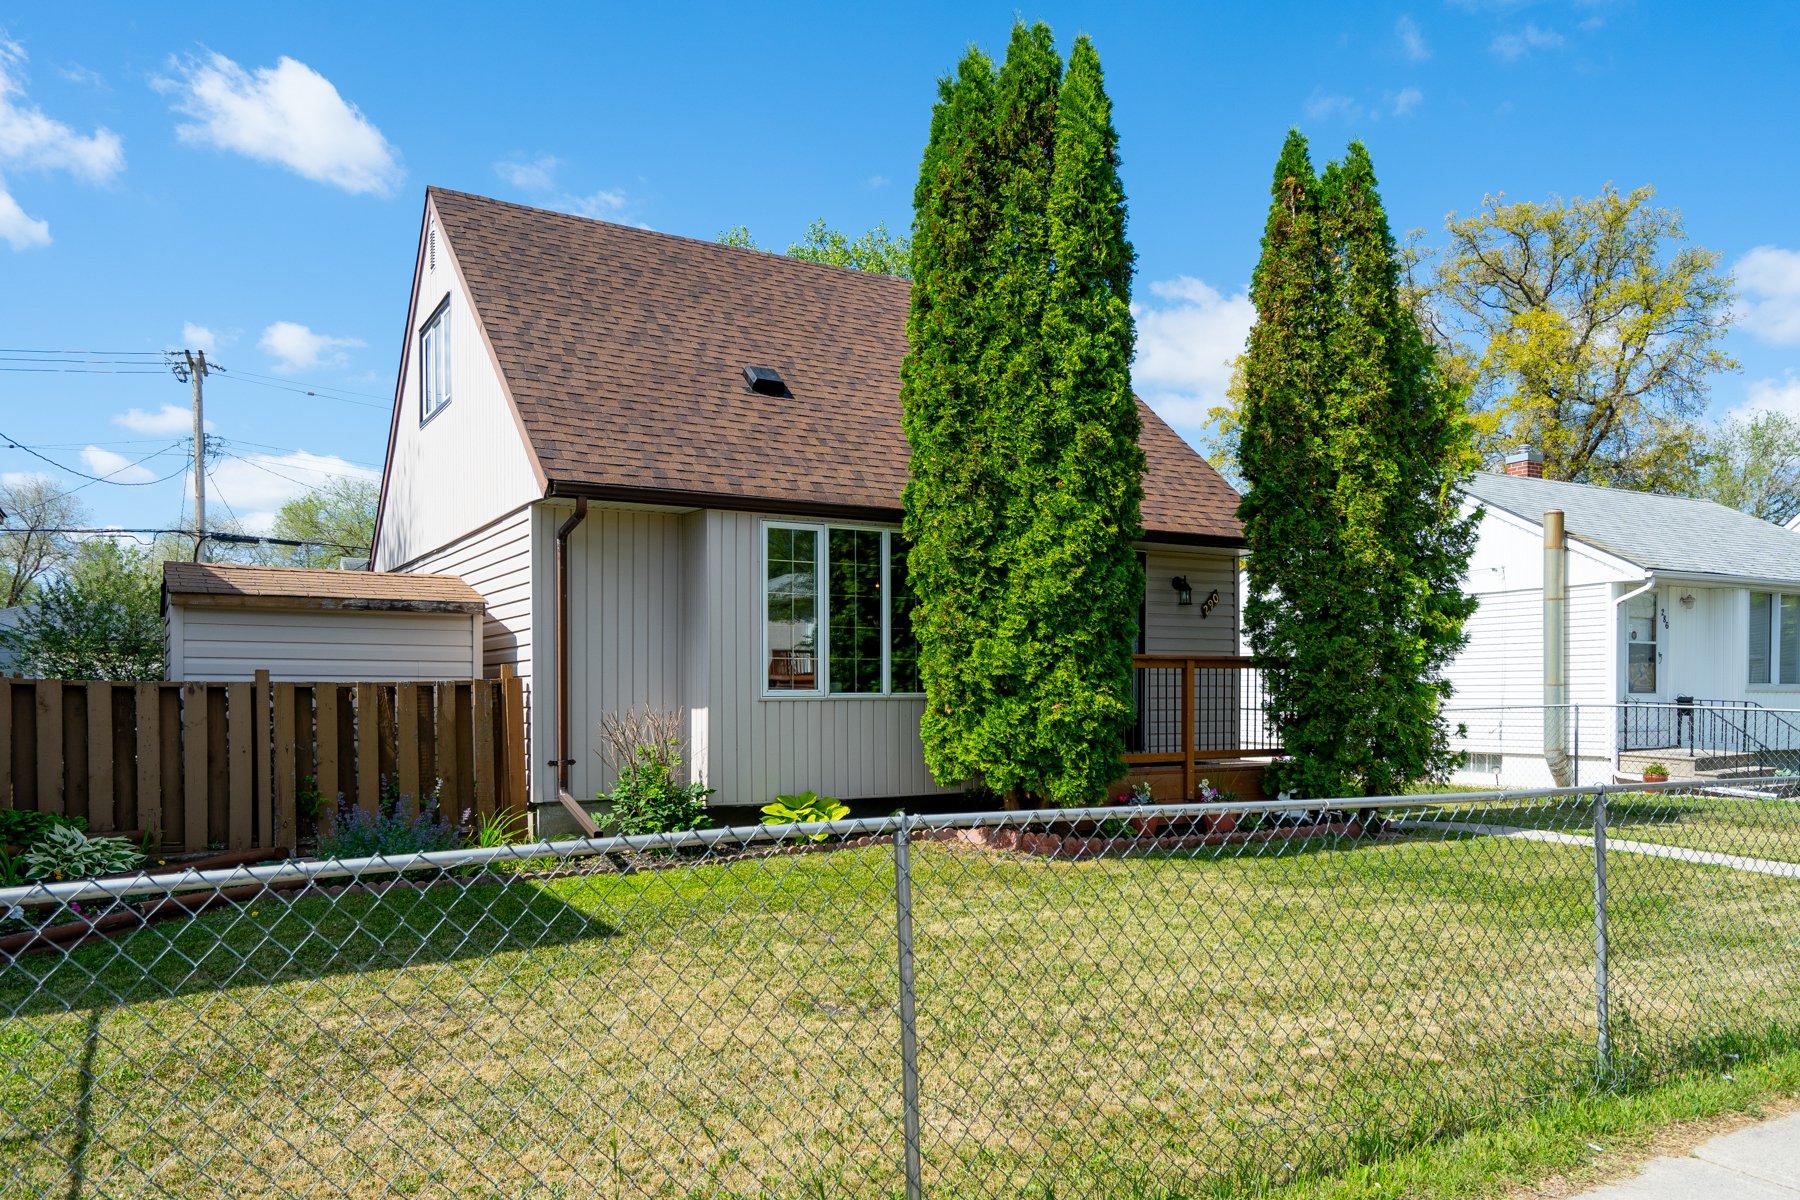 Main Photo: 290 Trent Avenue in Winnipeg: East Kildonan House for sale (3D)  : MLS®# 1916105